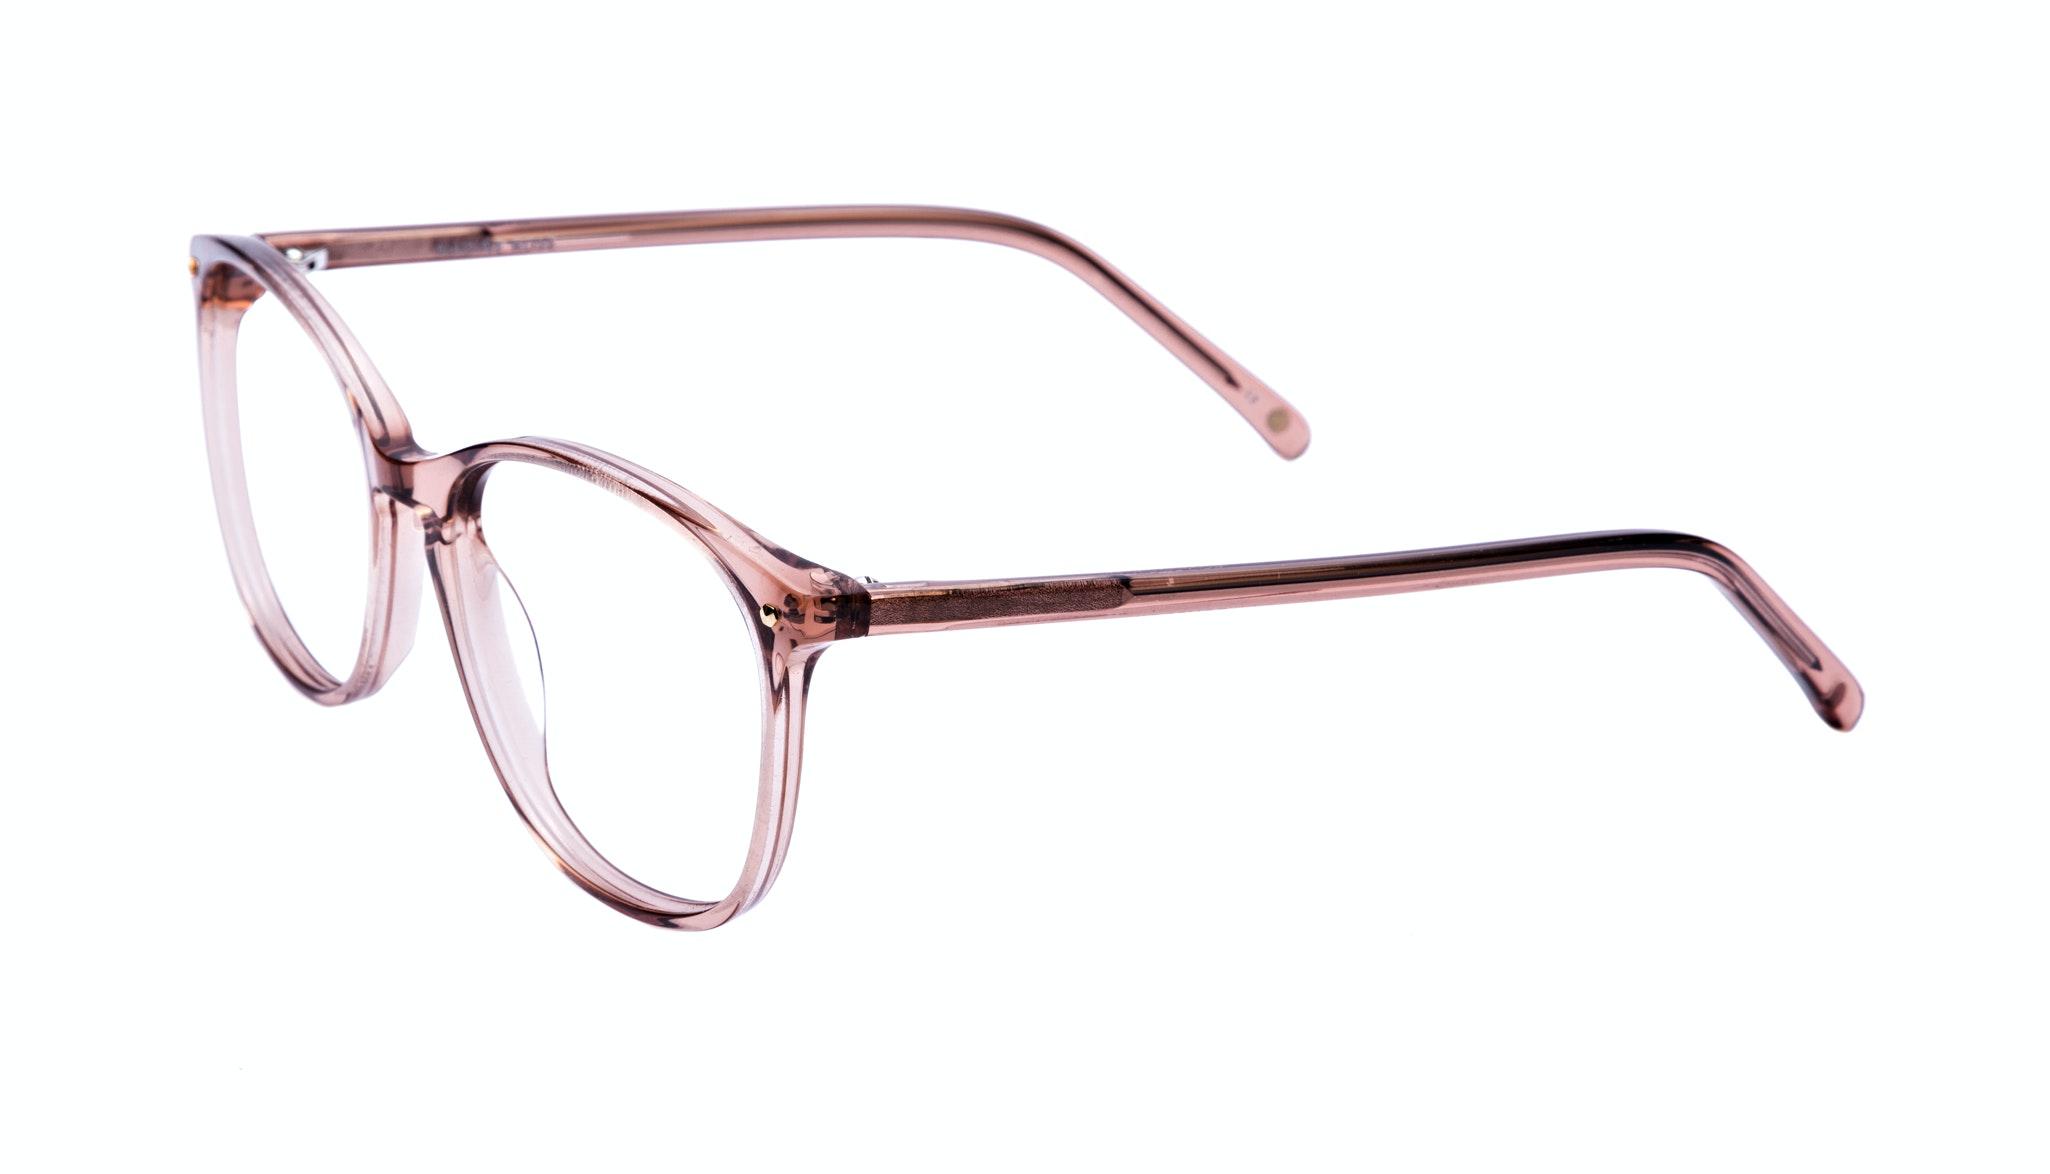 Affordable Fashion Glasses Rectangle Square Round Eyeglasses Women Nadine Rose Tilt